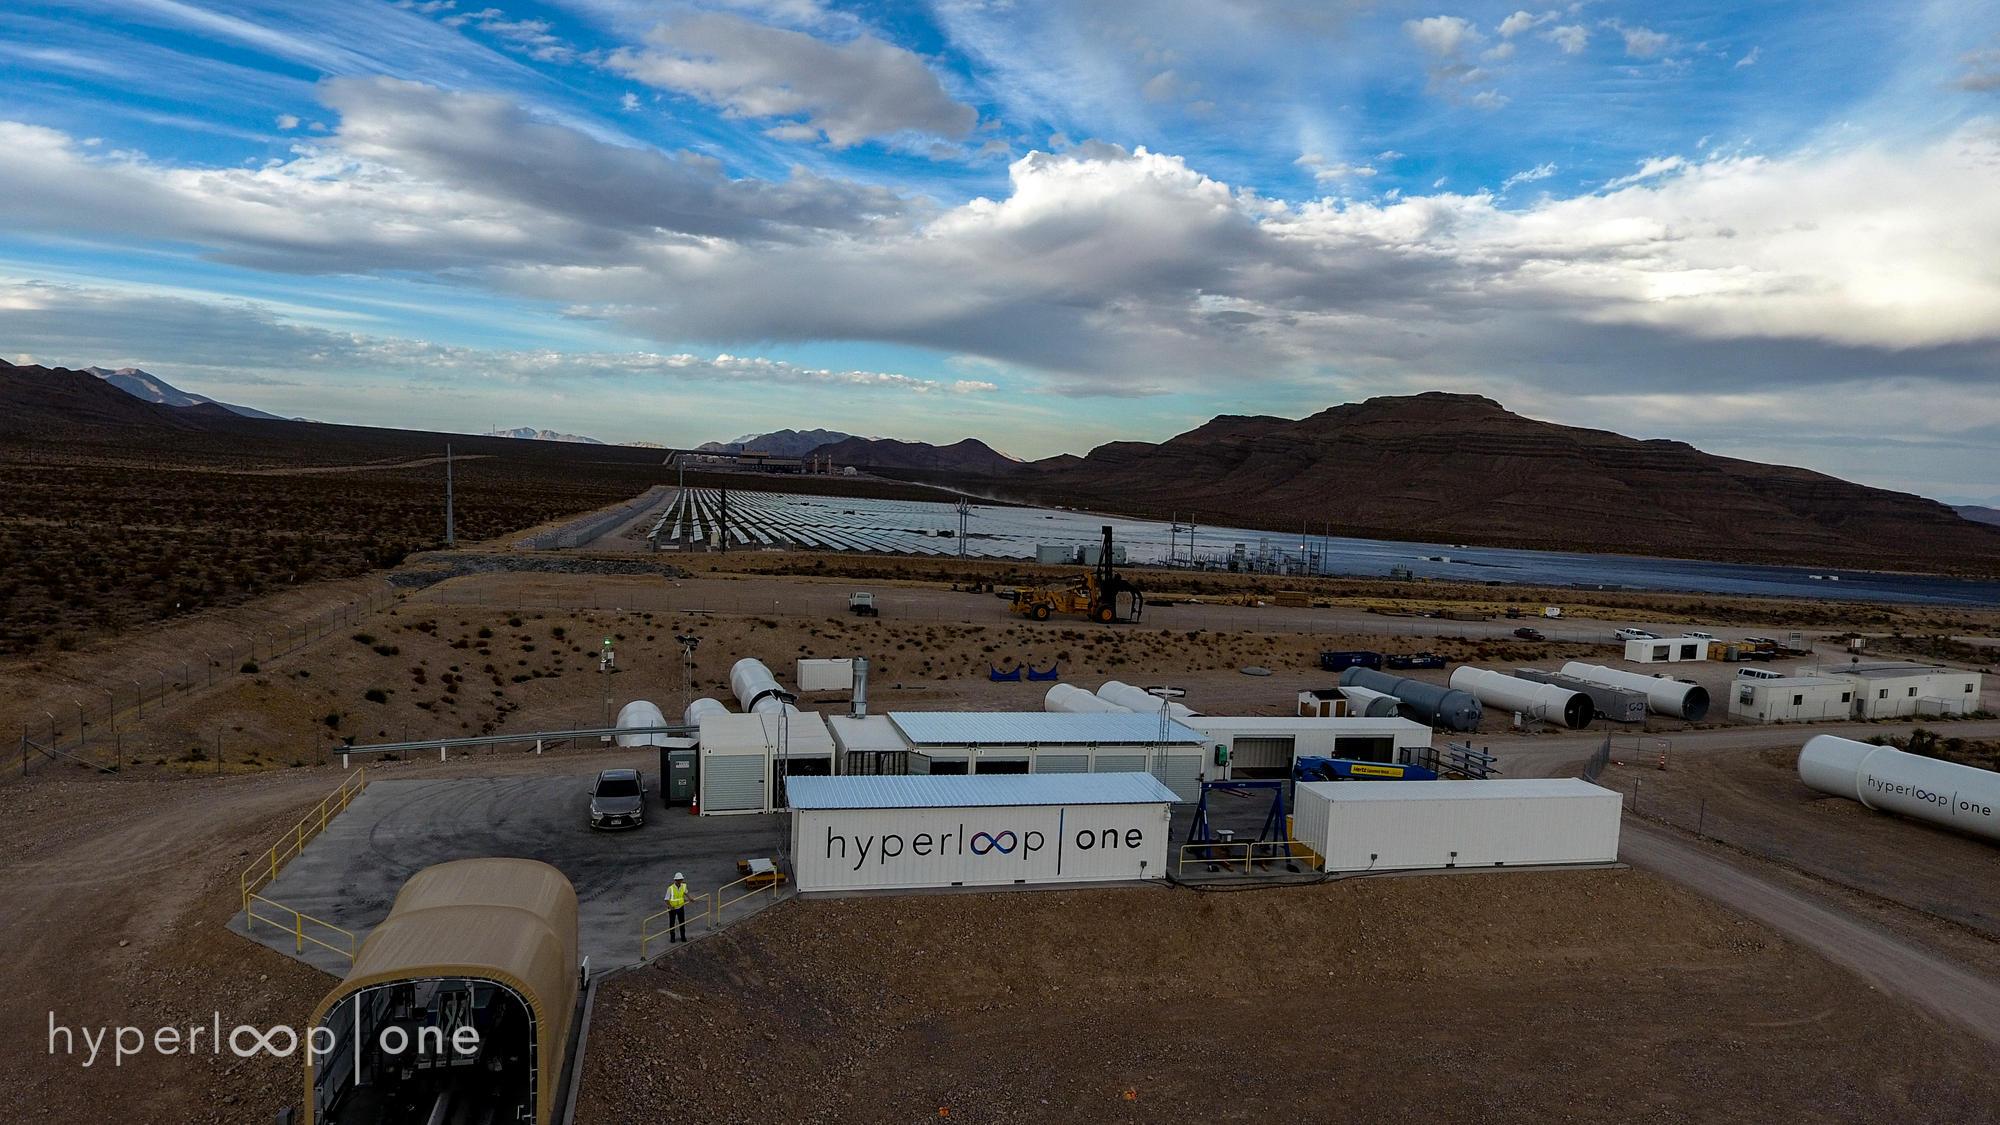 Hyperloop One facilities